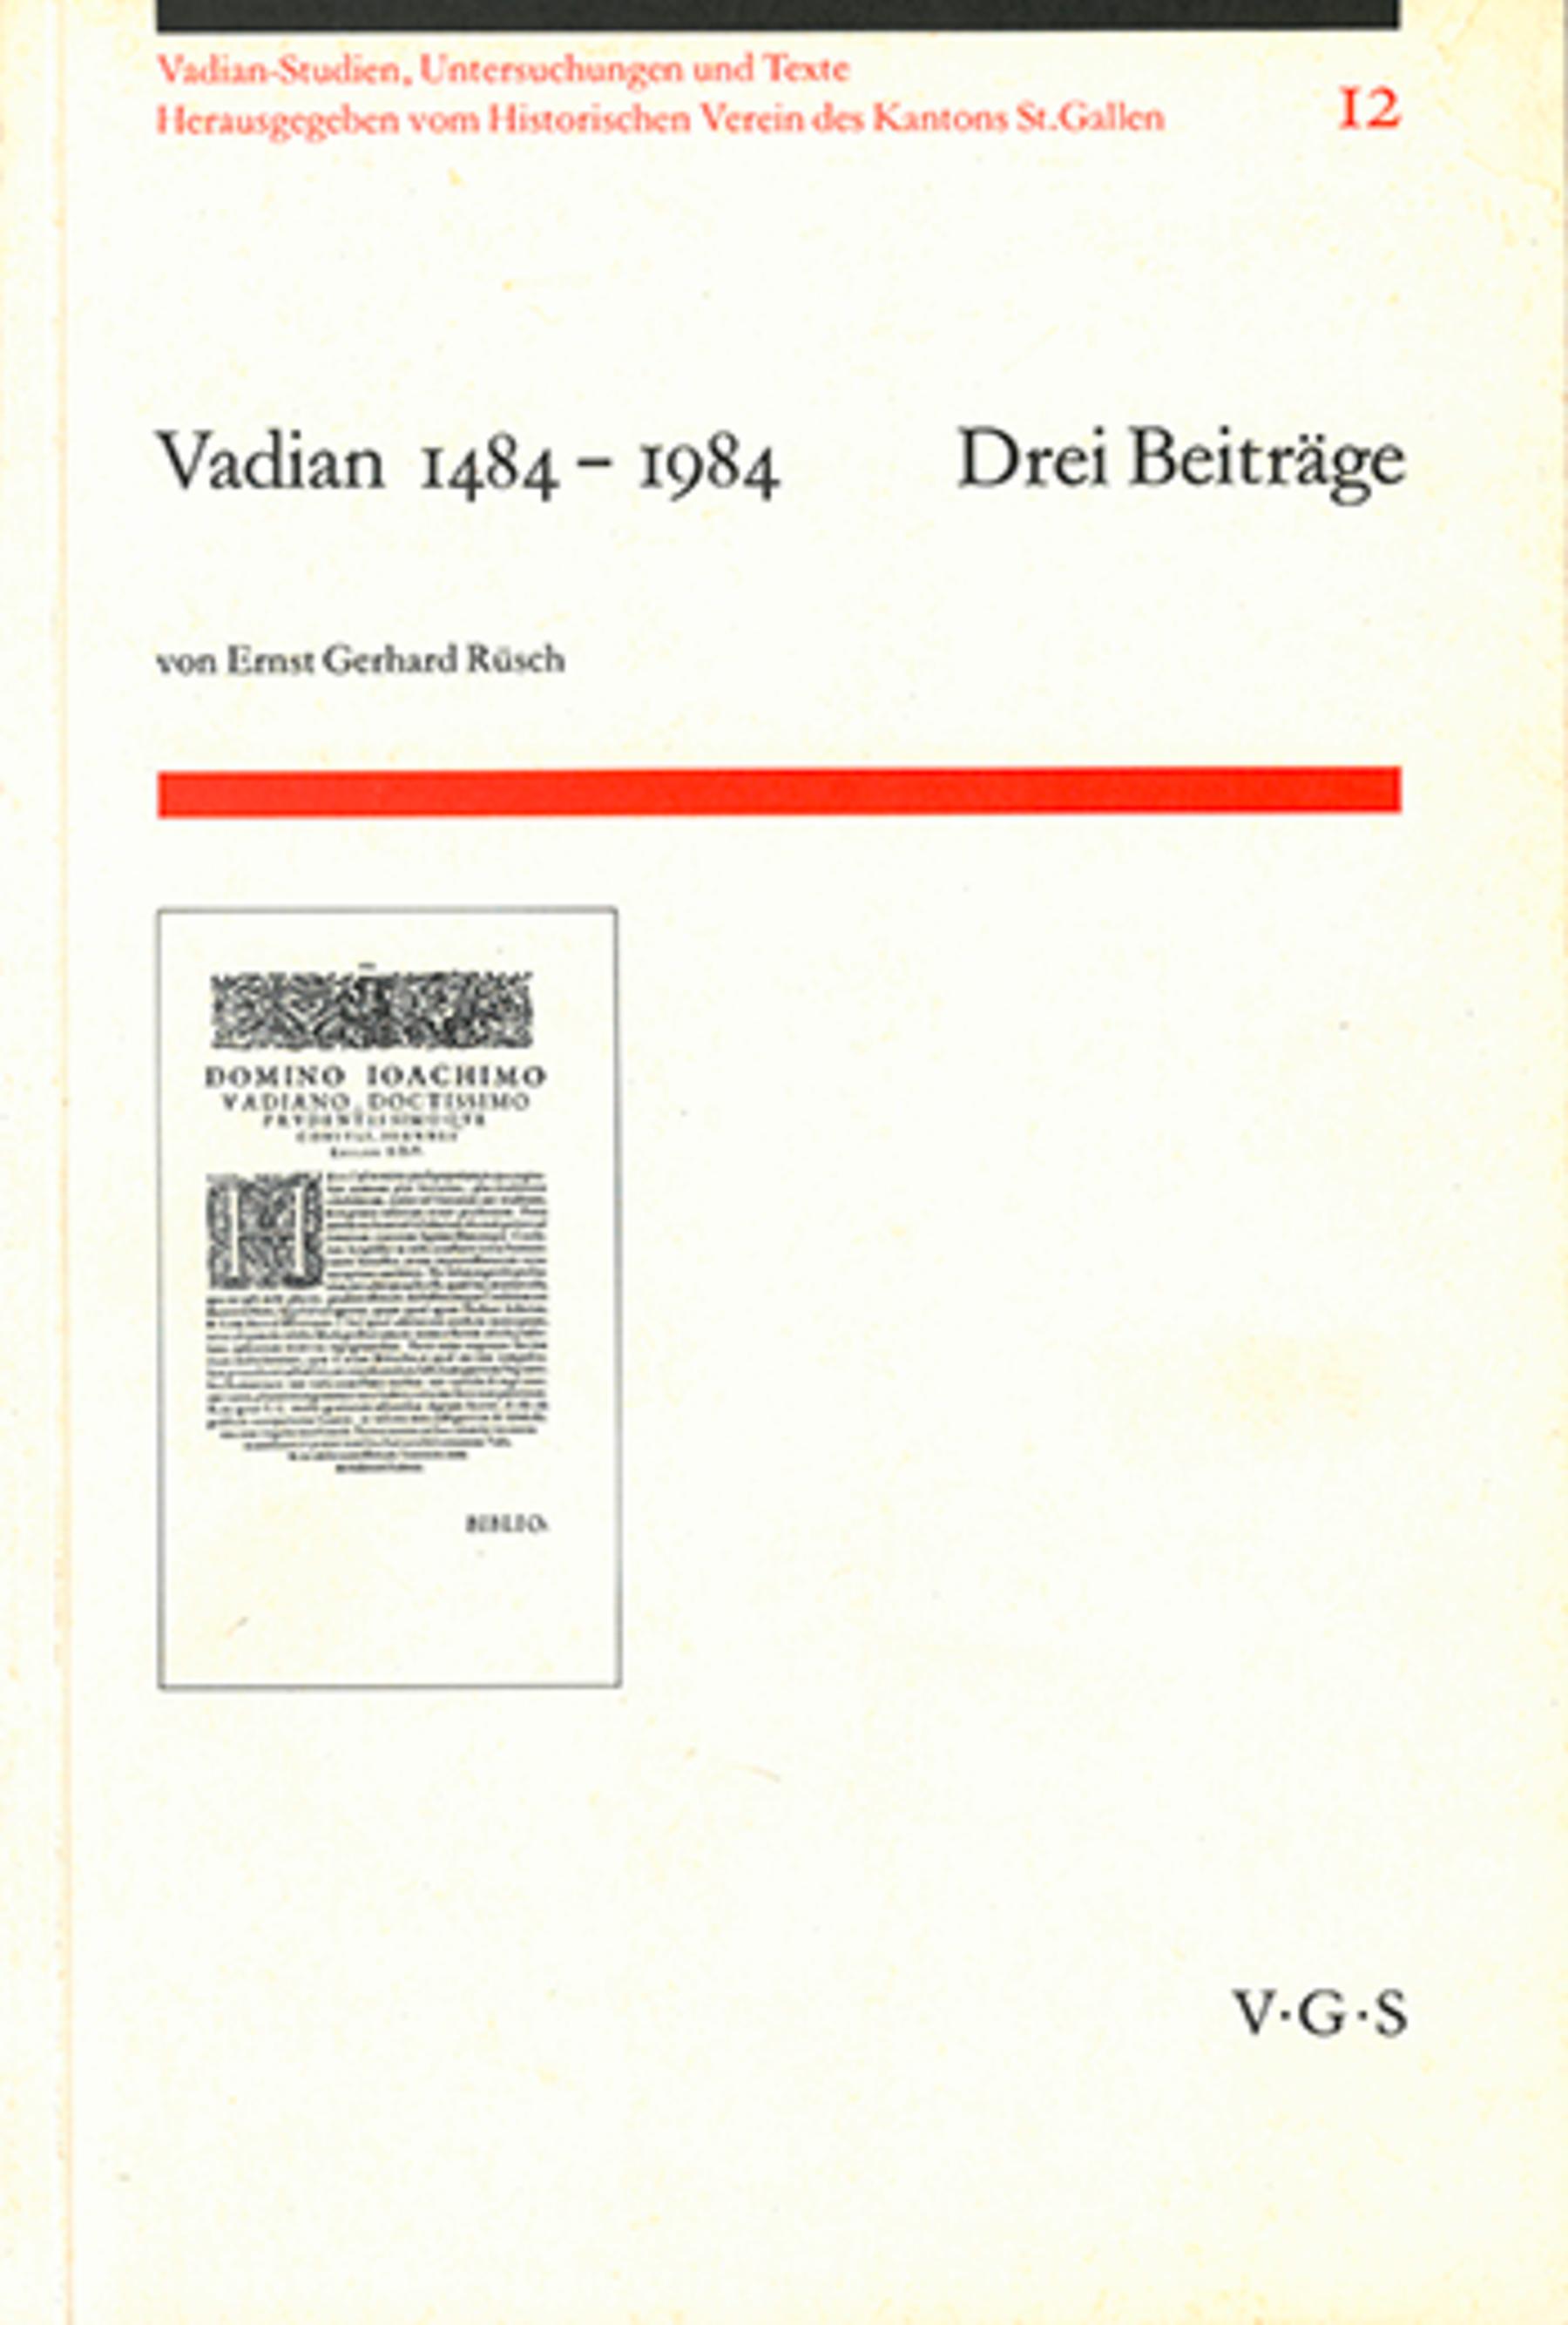 Vadian 1484-1984 - Drei Beiträge